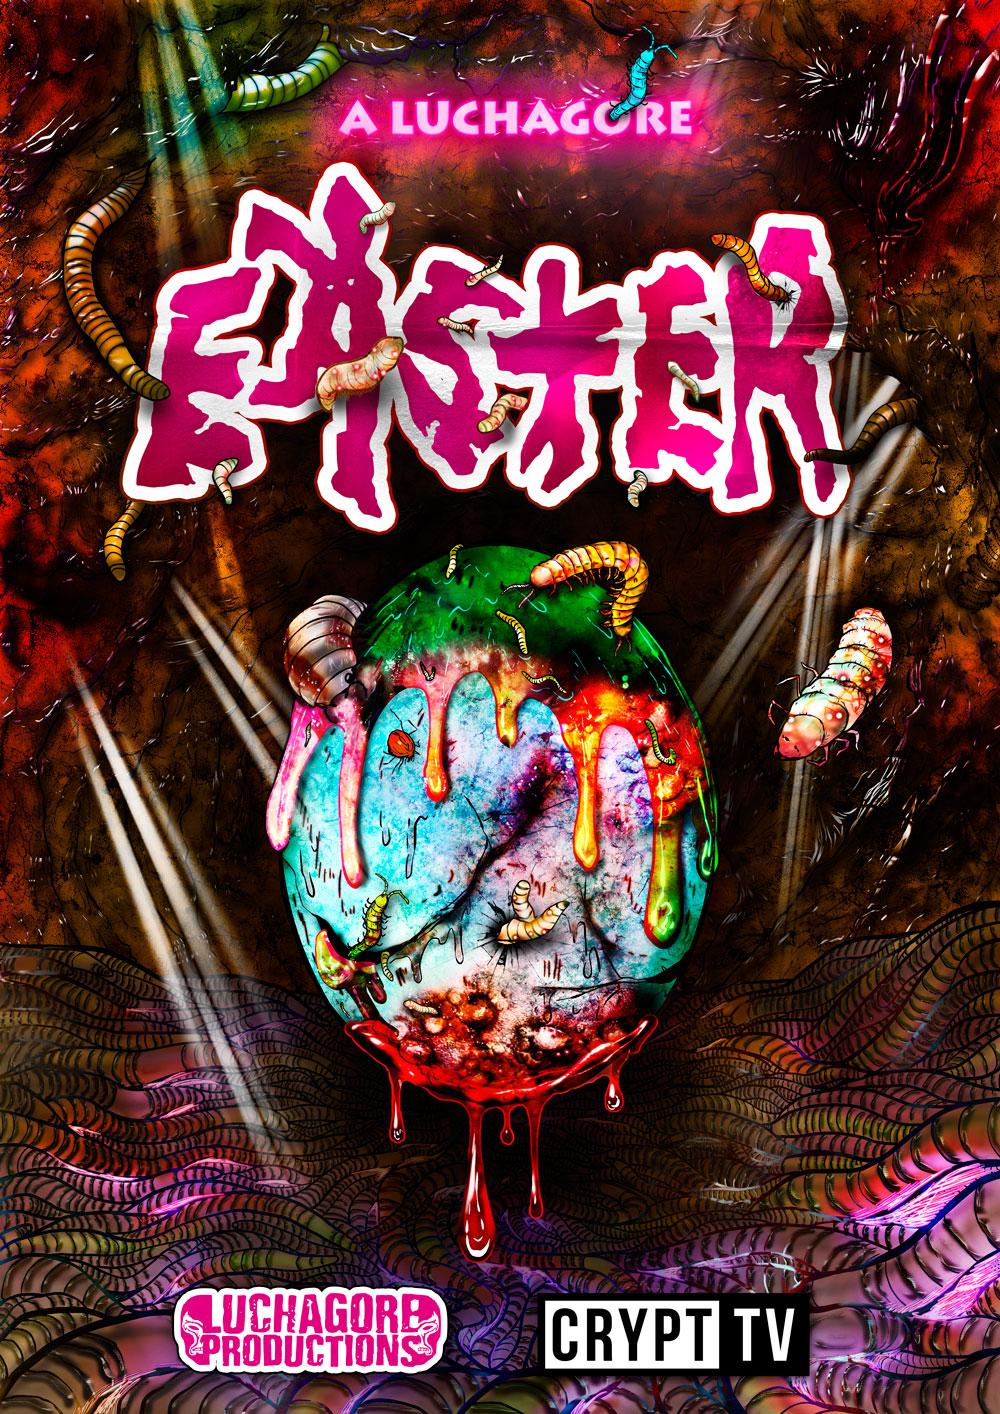 A Luchagore Easter kapak